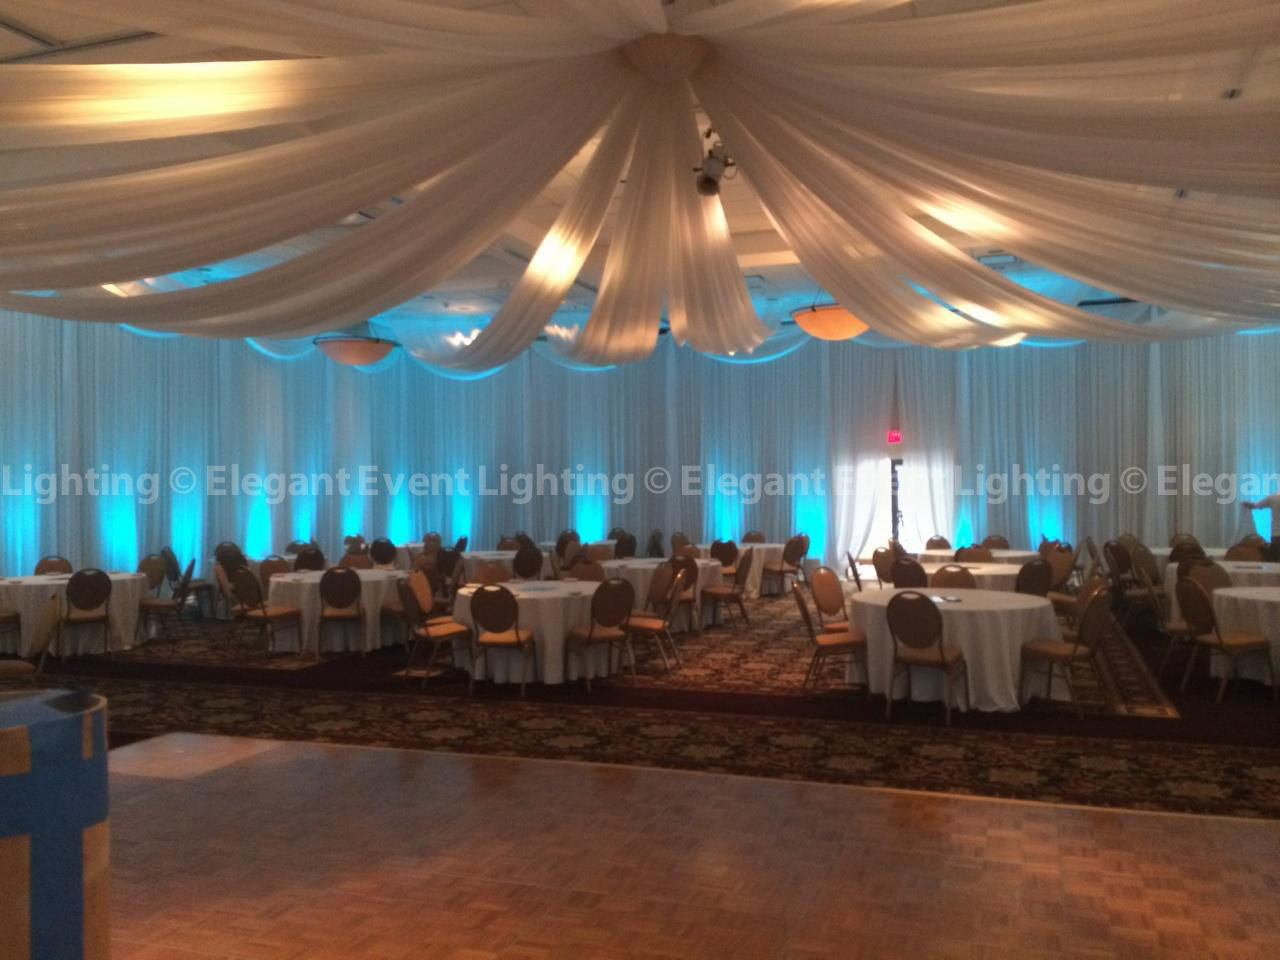 elegant event lighting weekend in review june 11